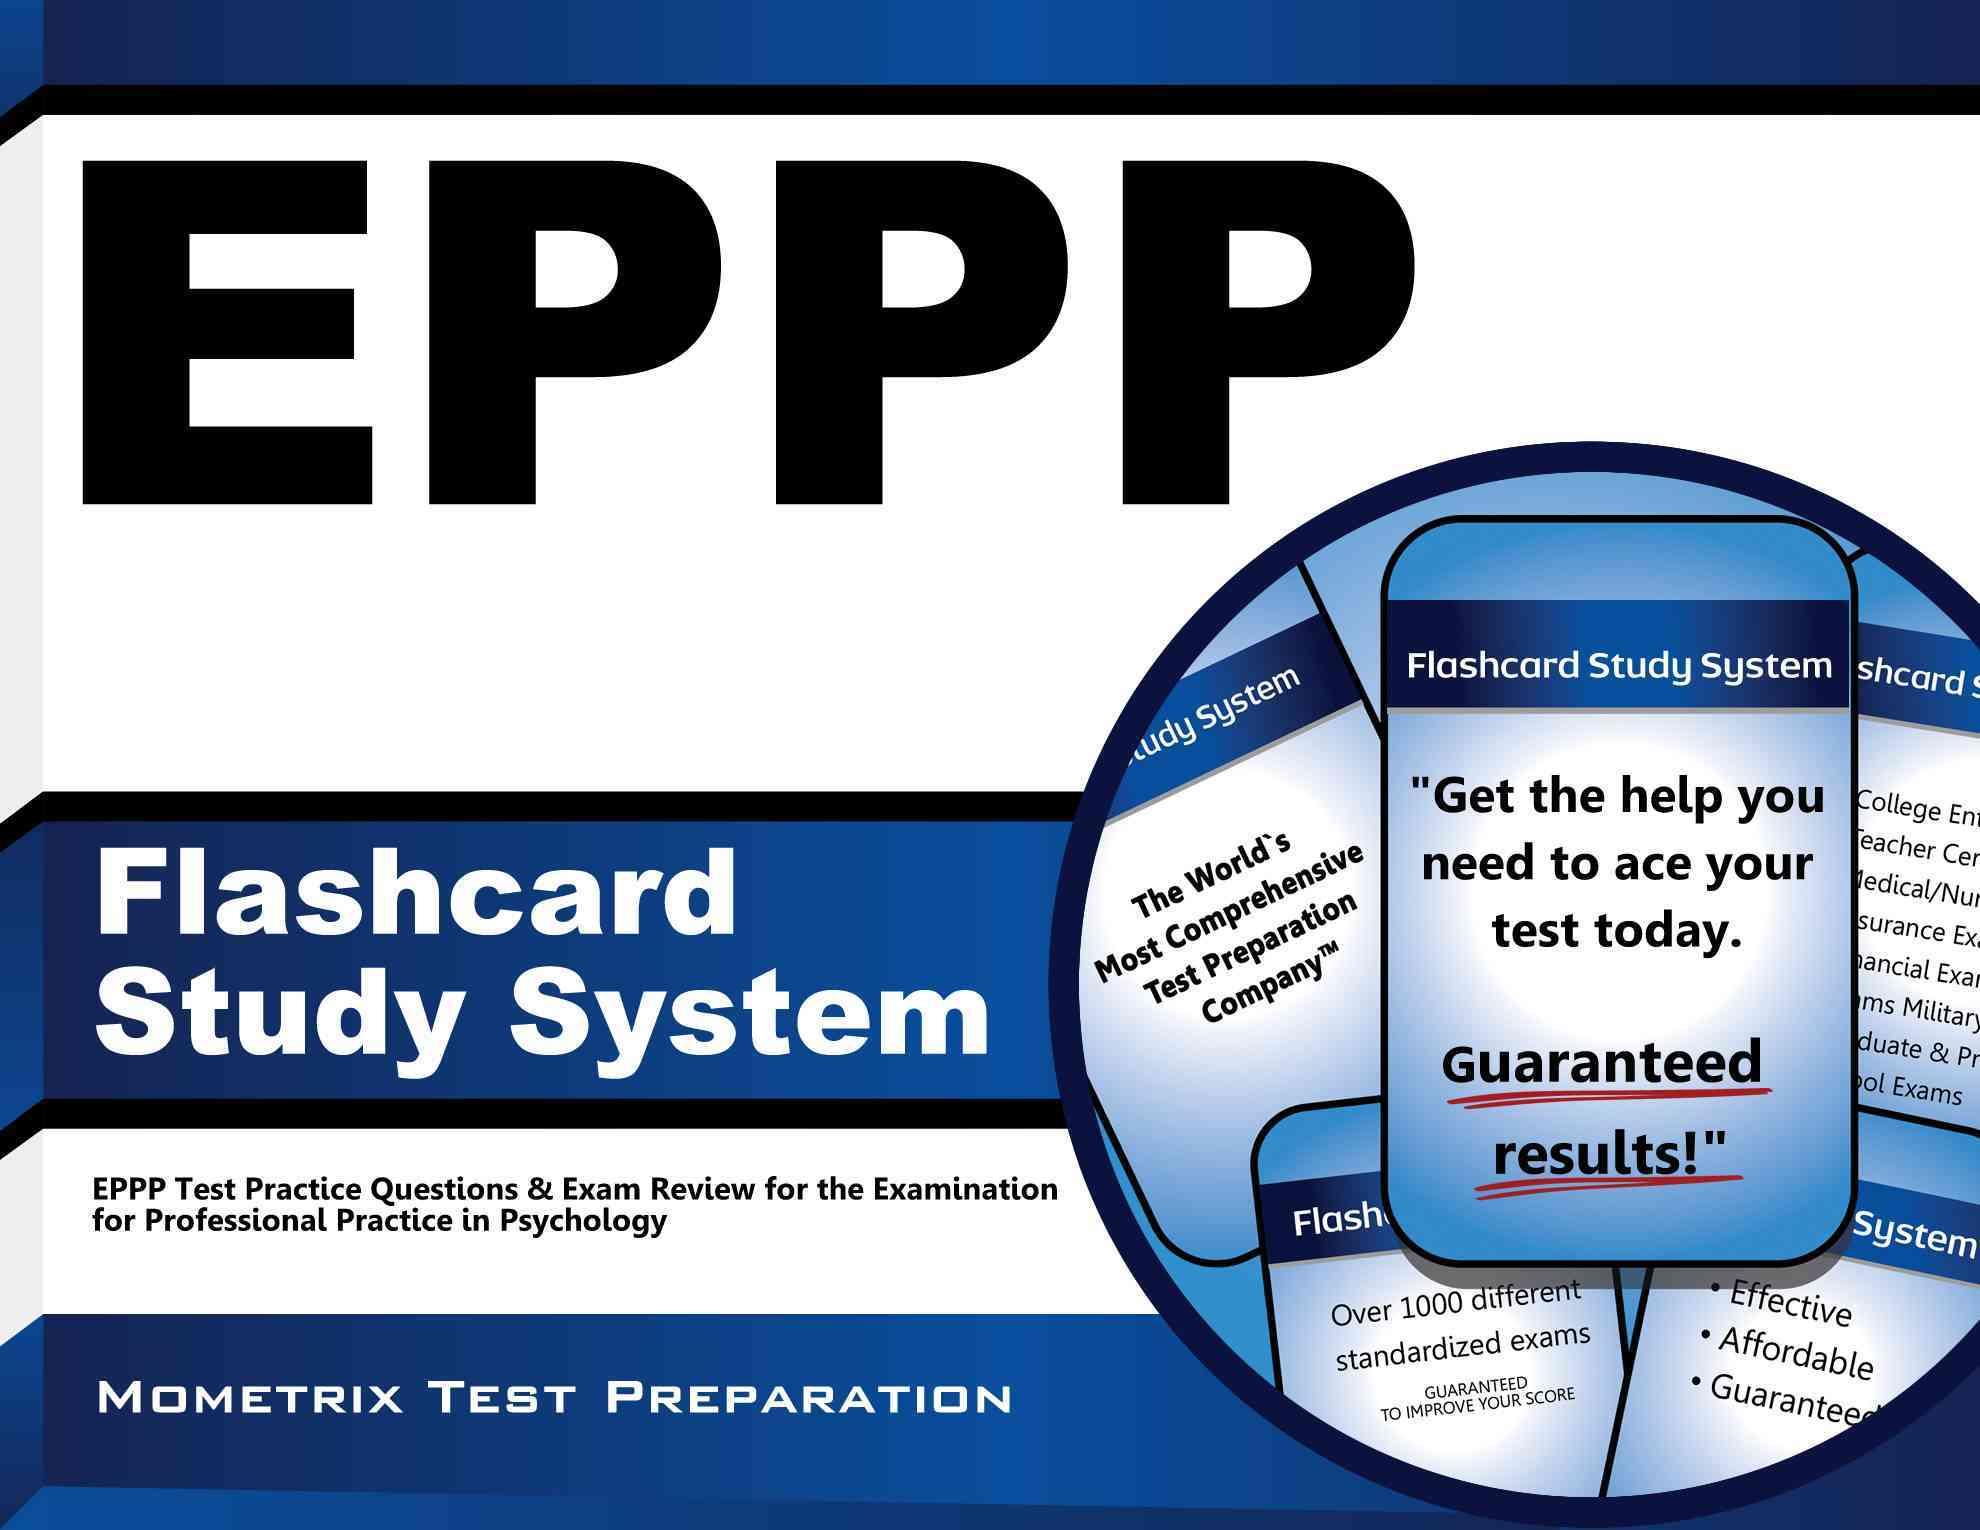 Eppp Flashcard Study System By Eppp Exam Secrets (EDT)